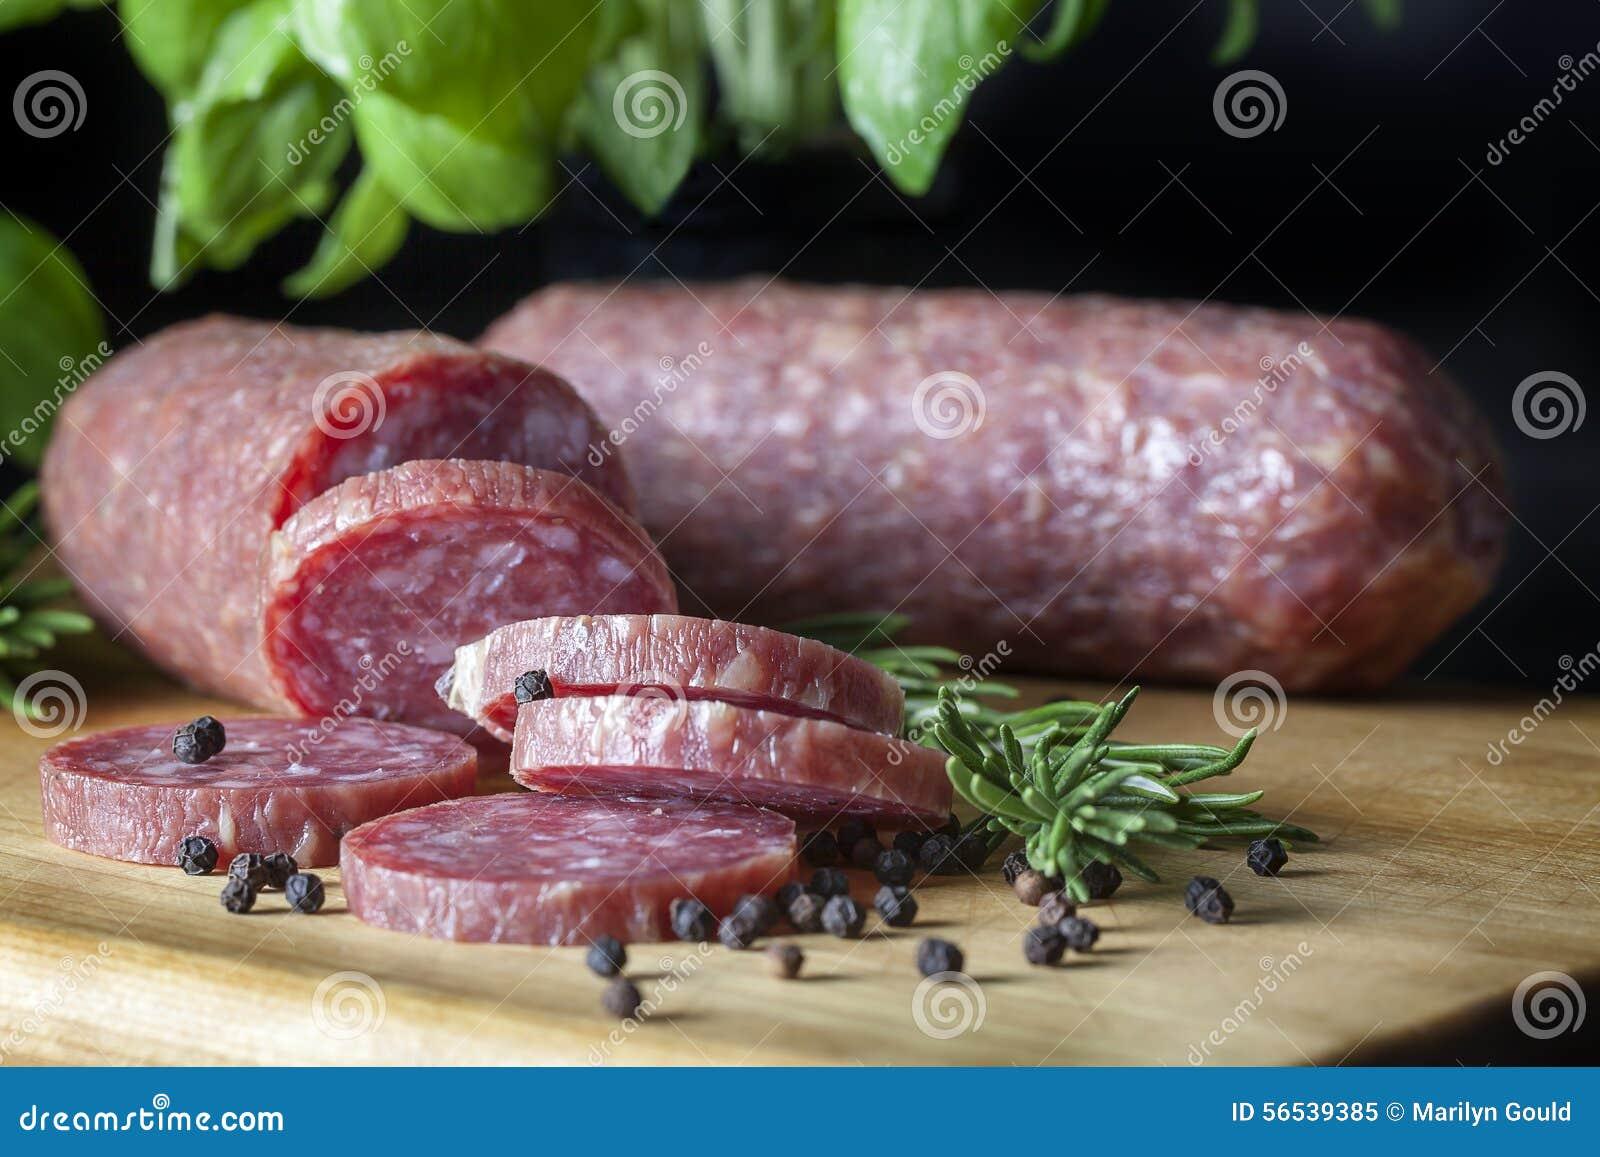 Salami Sliced on Wood Board